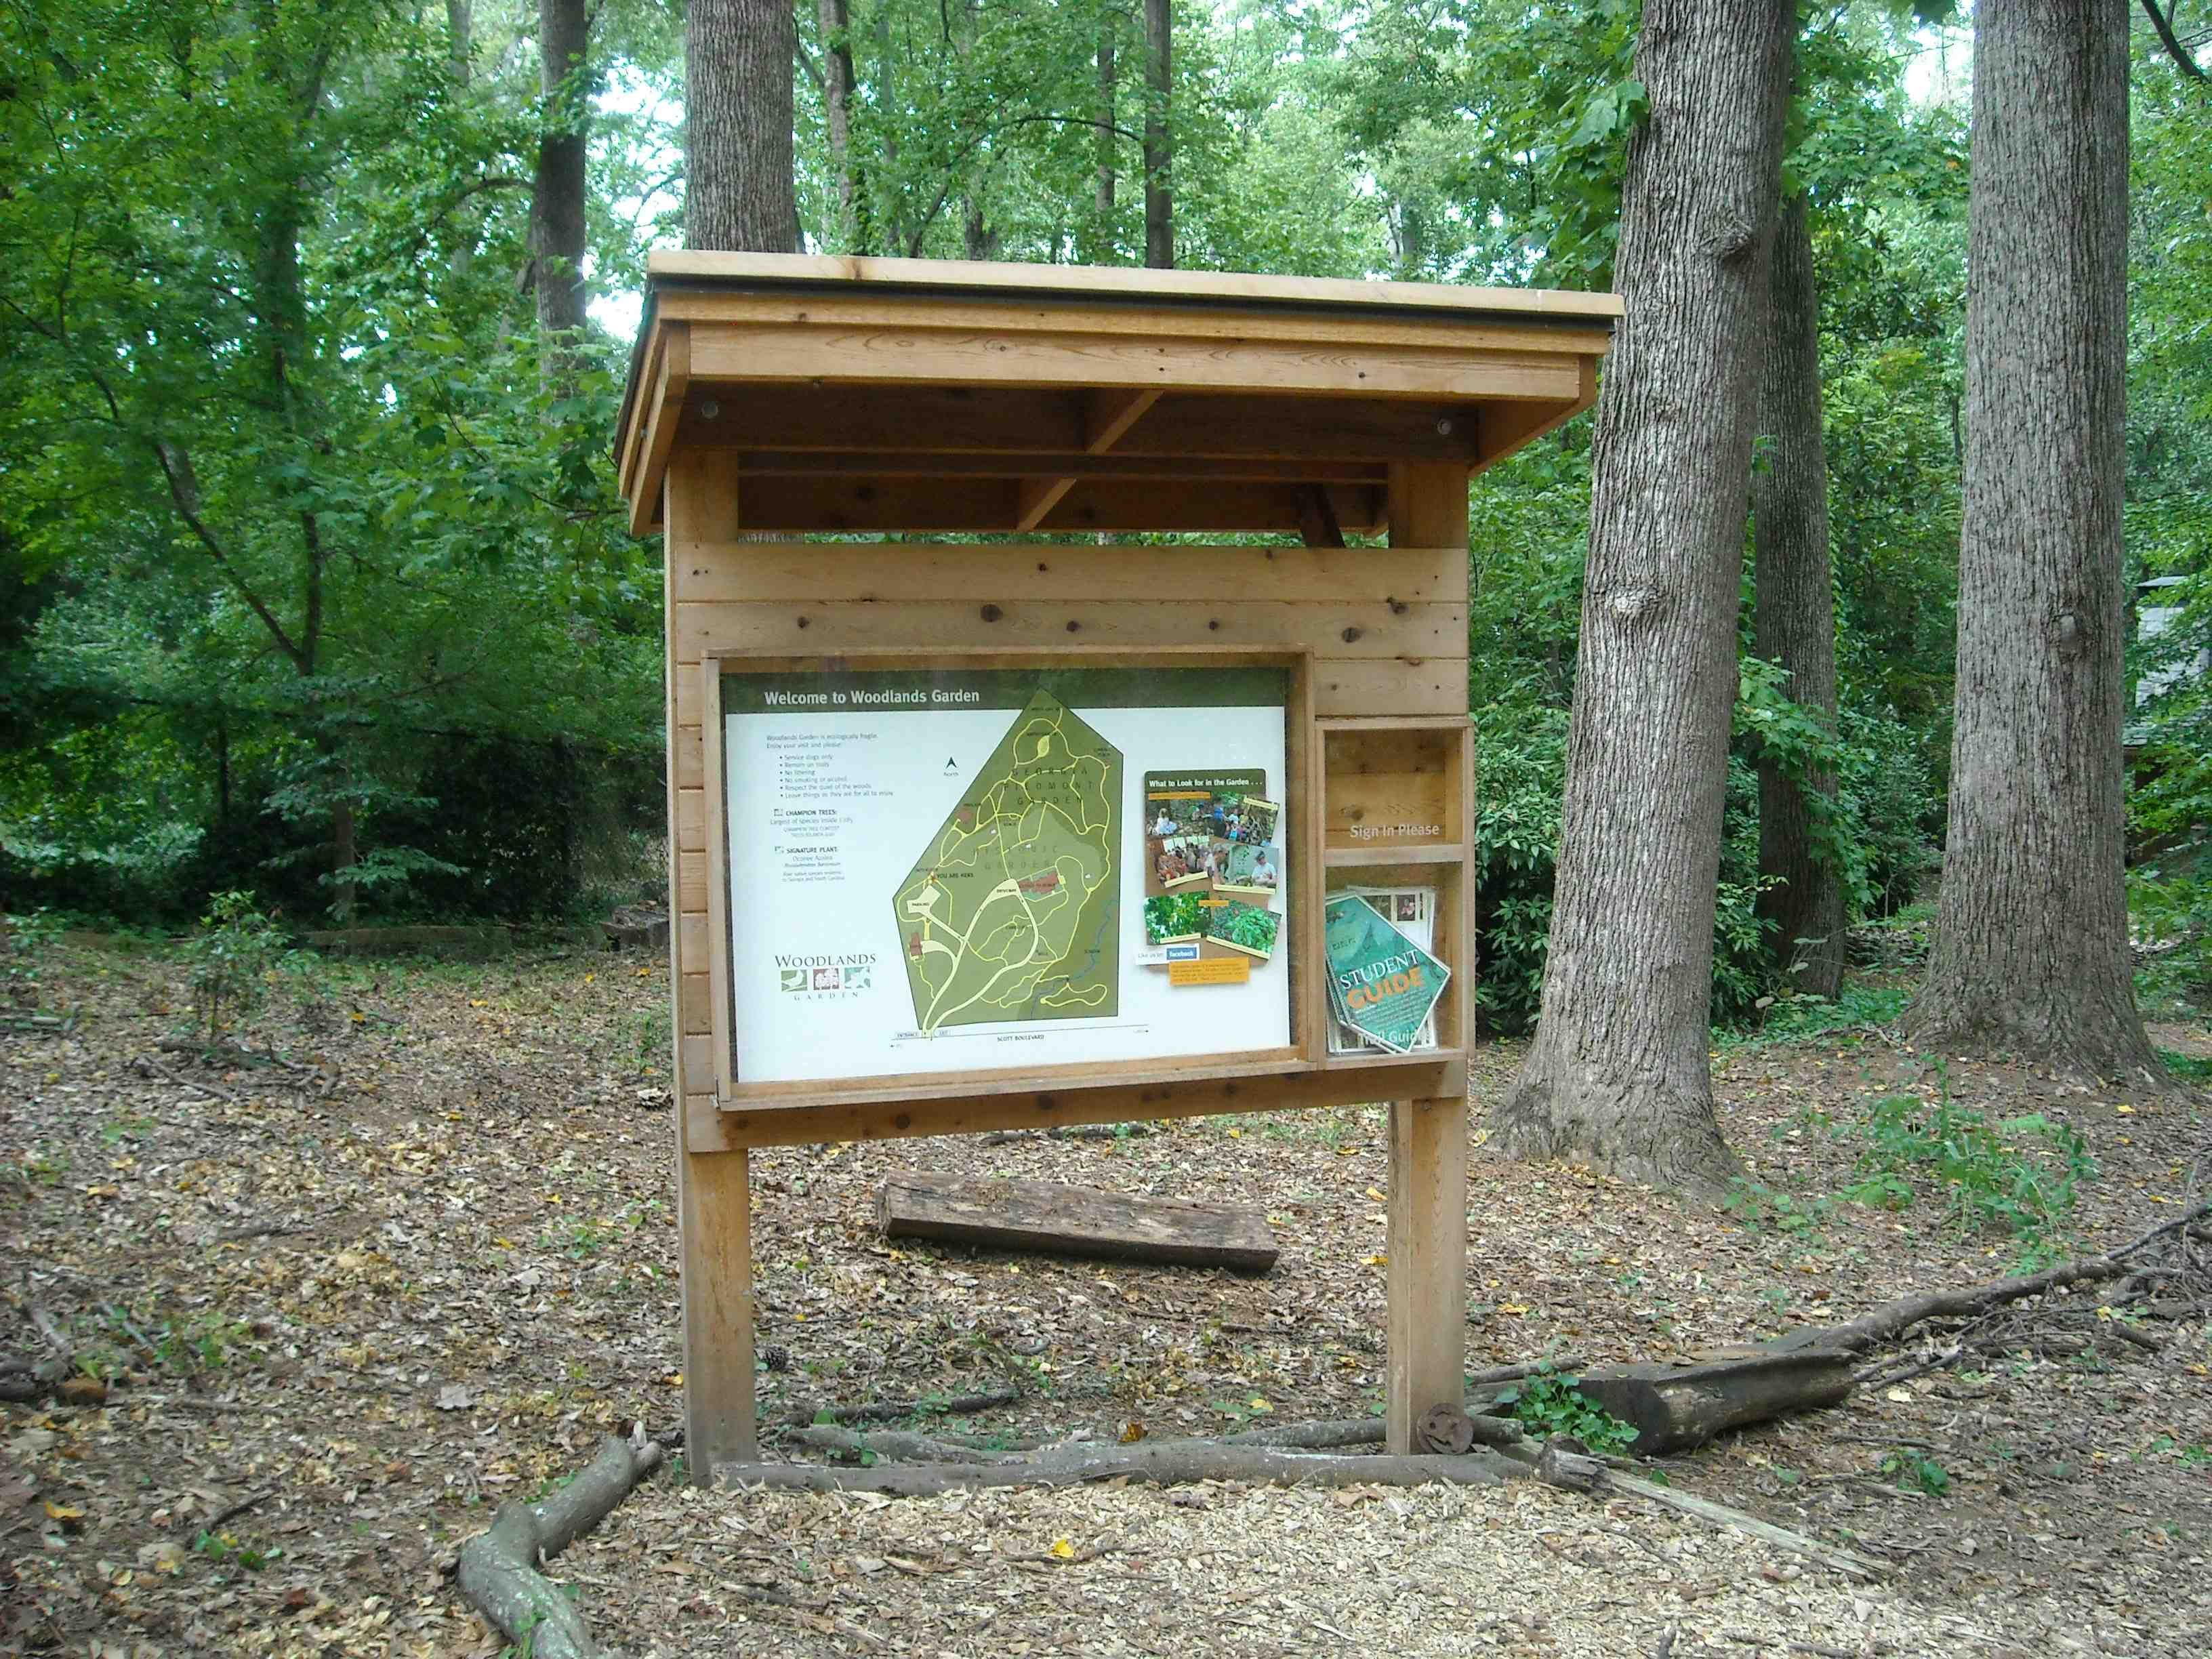 Outdoor Information Kiosk : nature kiosks google search kiosk design parking design information kiosk ~ Yuntae.com Dekorationen Ideen